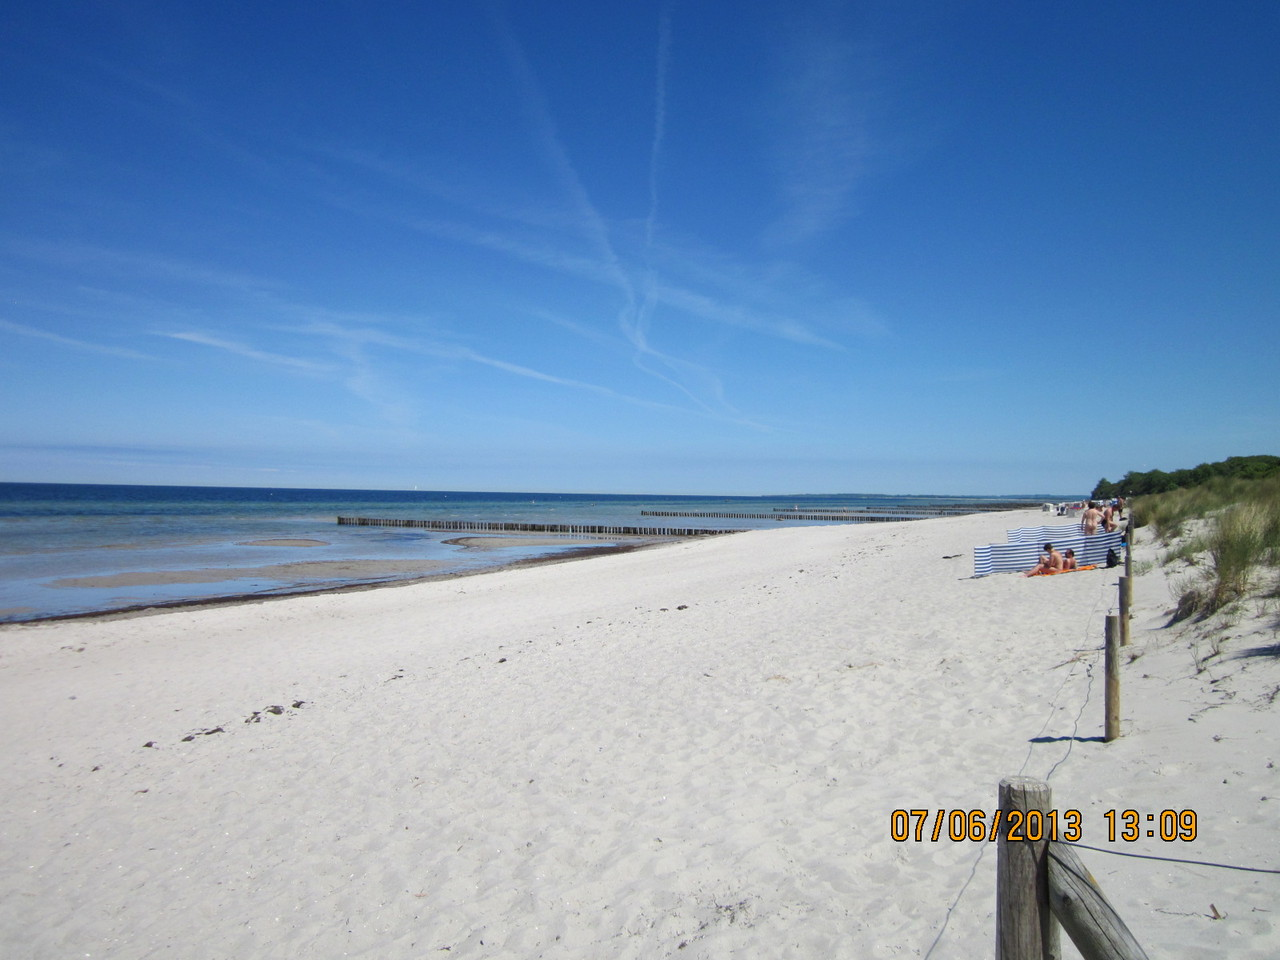 Strandabschnitt auf Poel